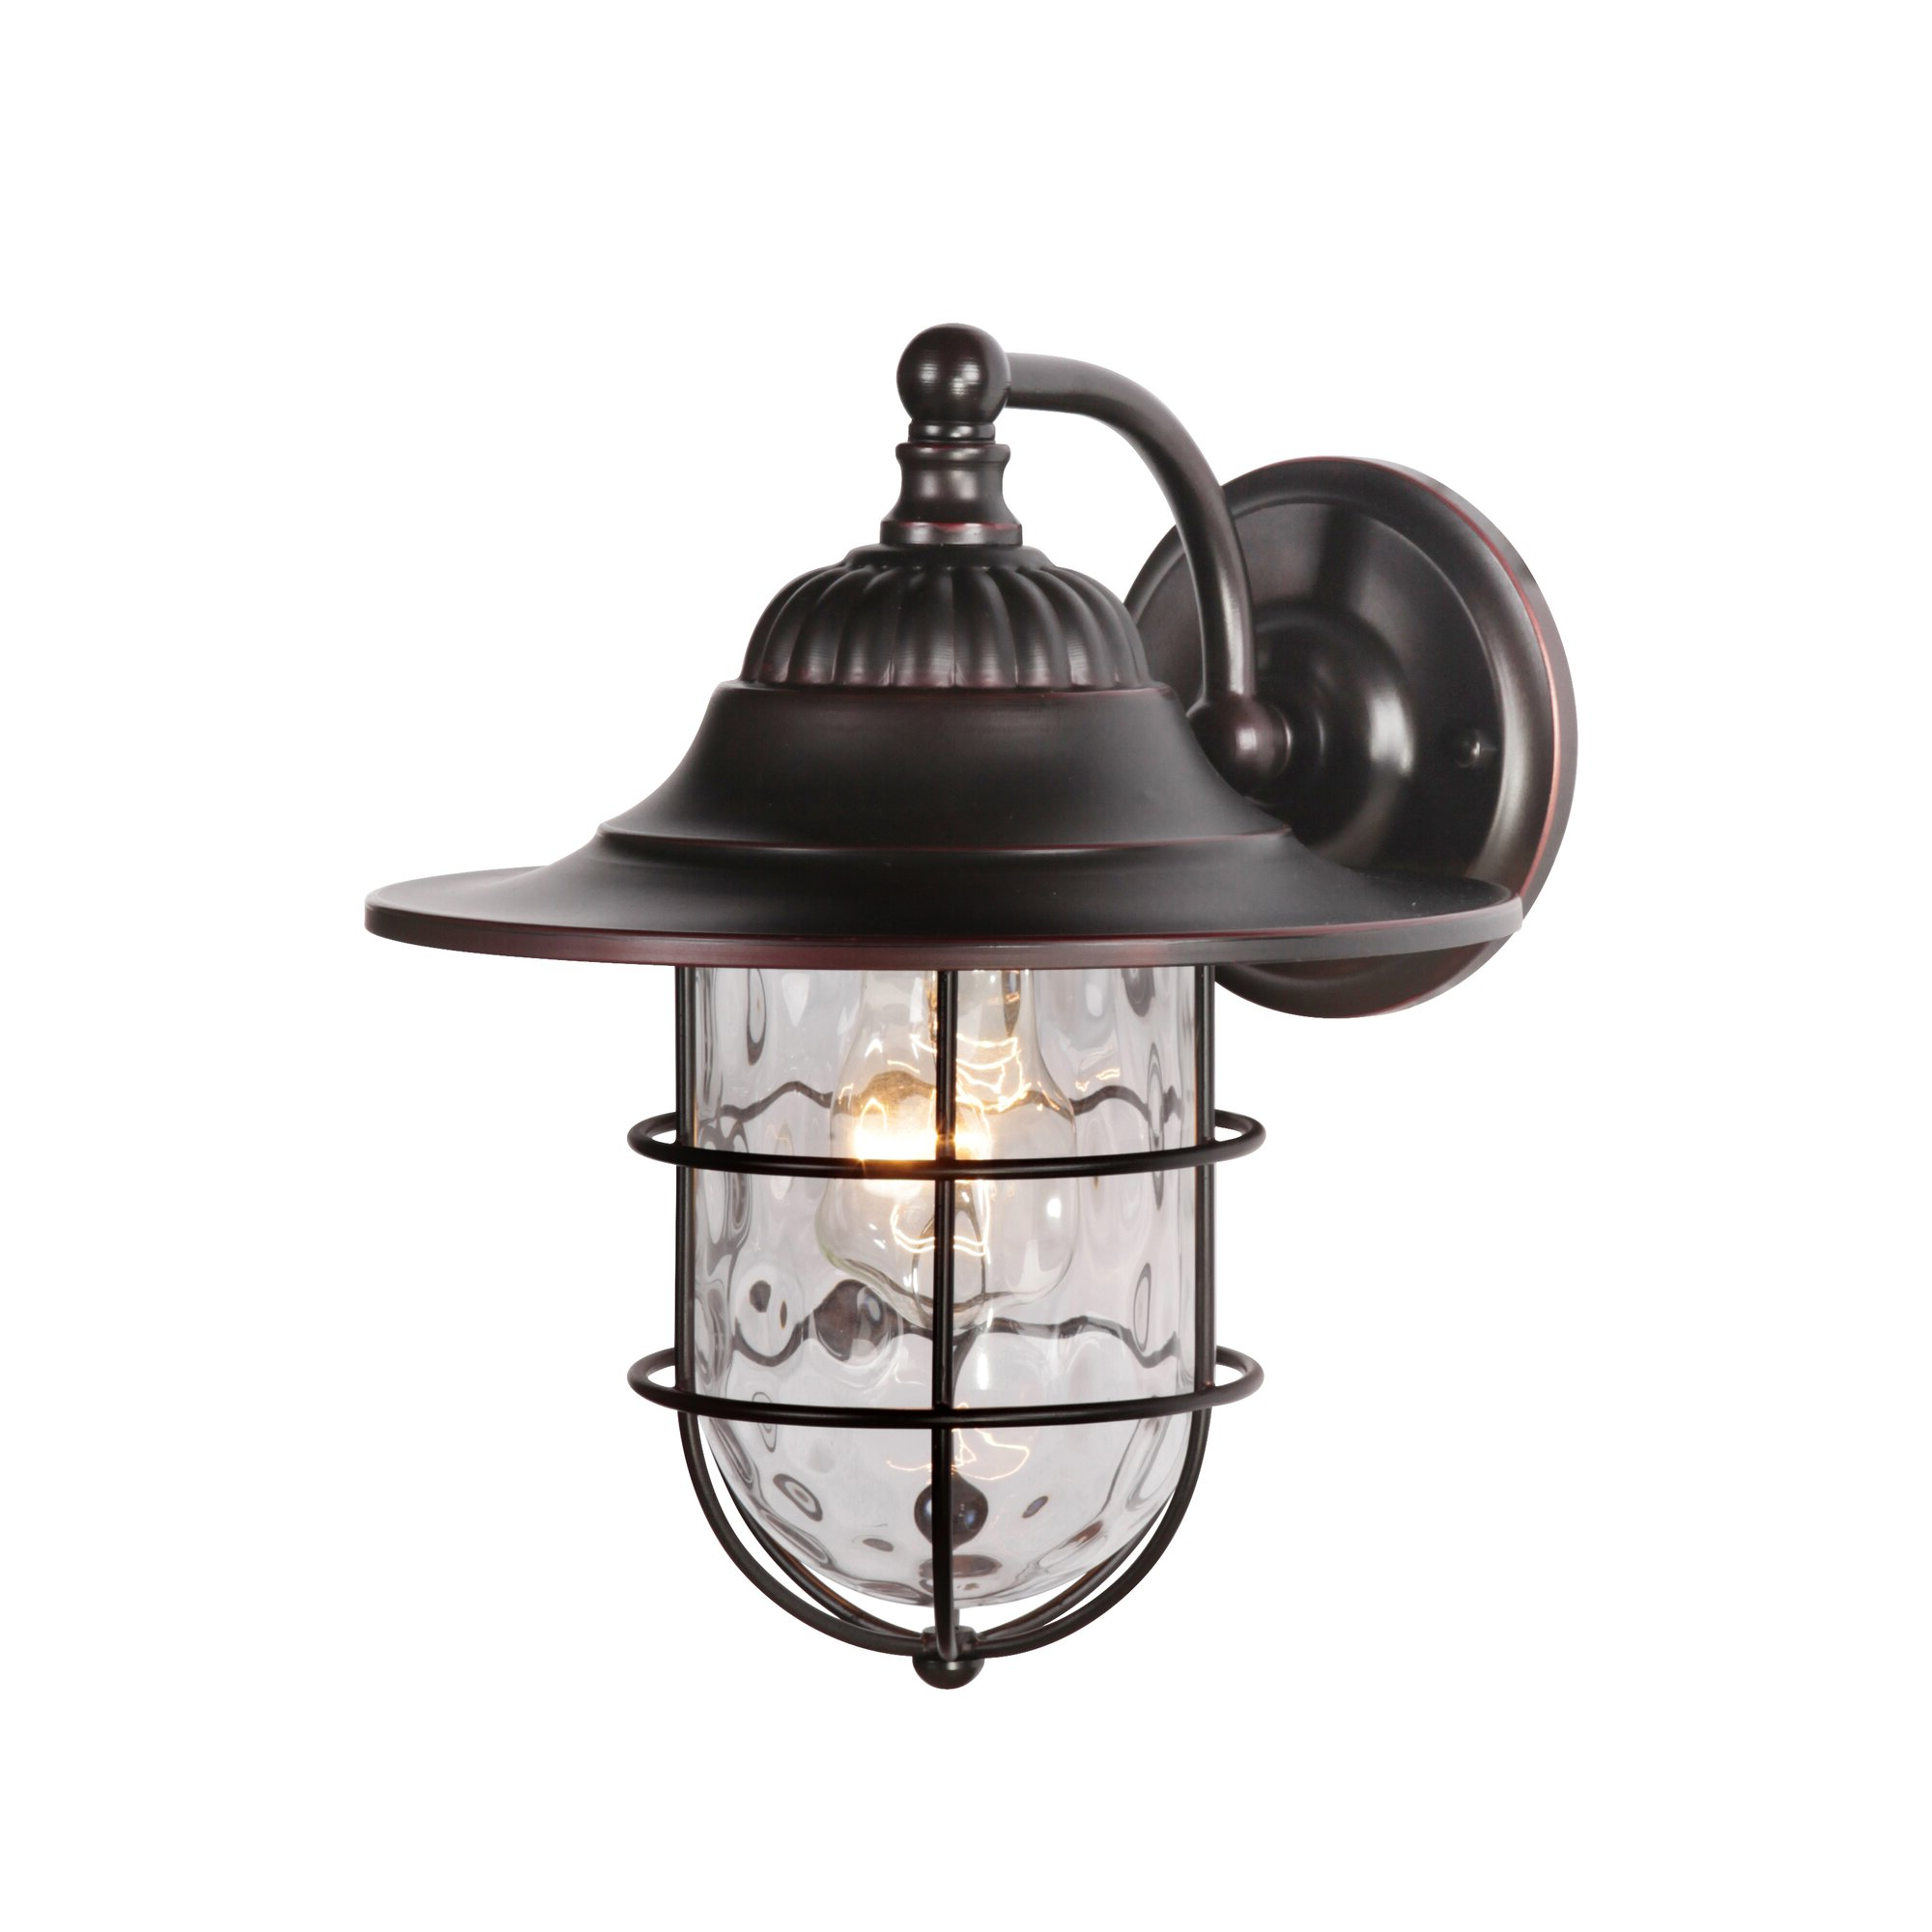 2018 Arryonna Outdoor Barn Lights Regarding Craftmade Fairmont 1 Light Outdoor Barn Light & Reviews (View 16 of 20)